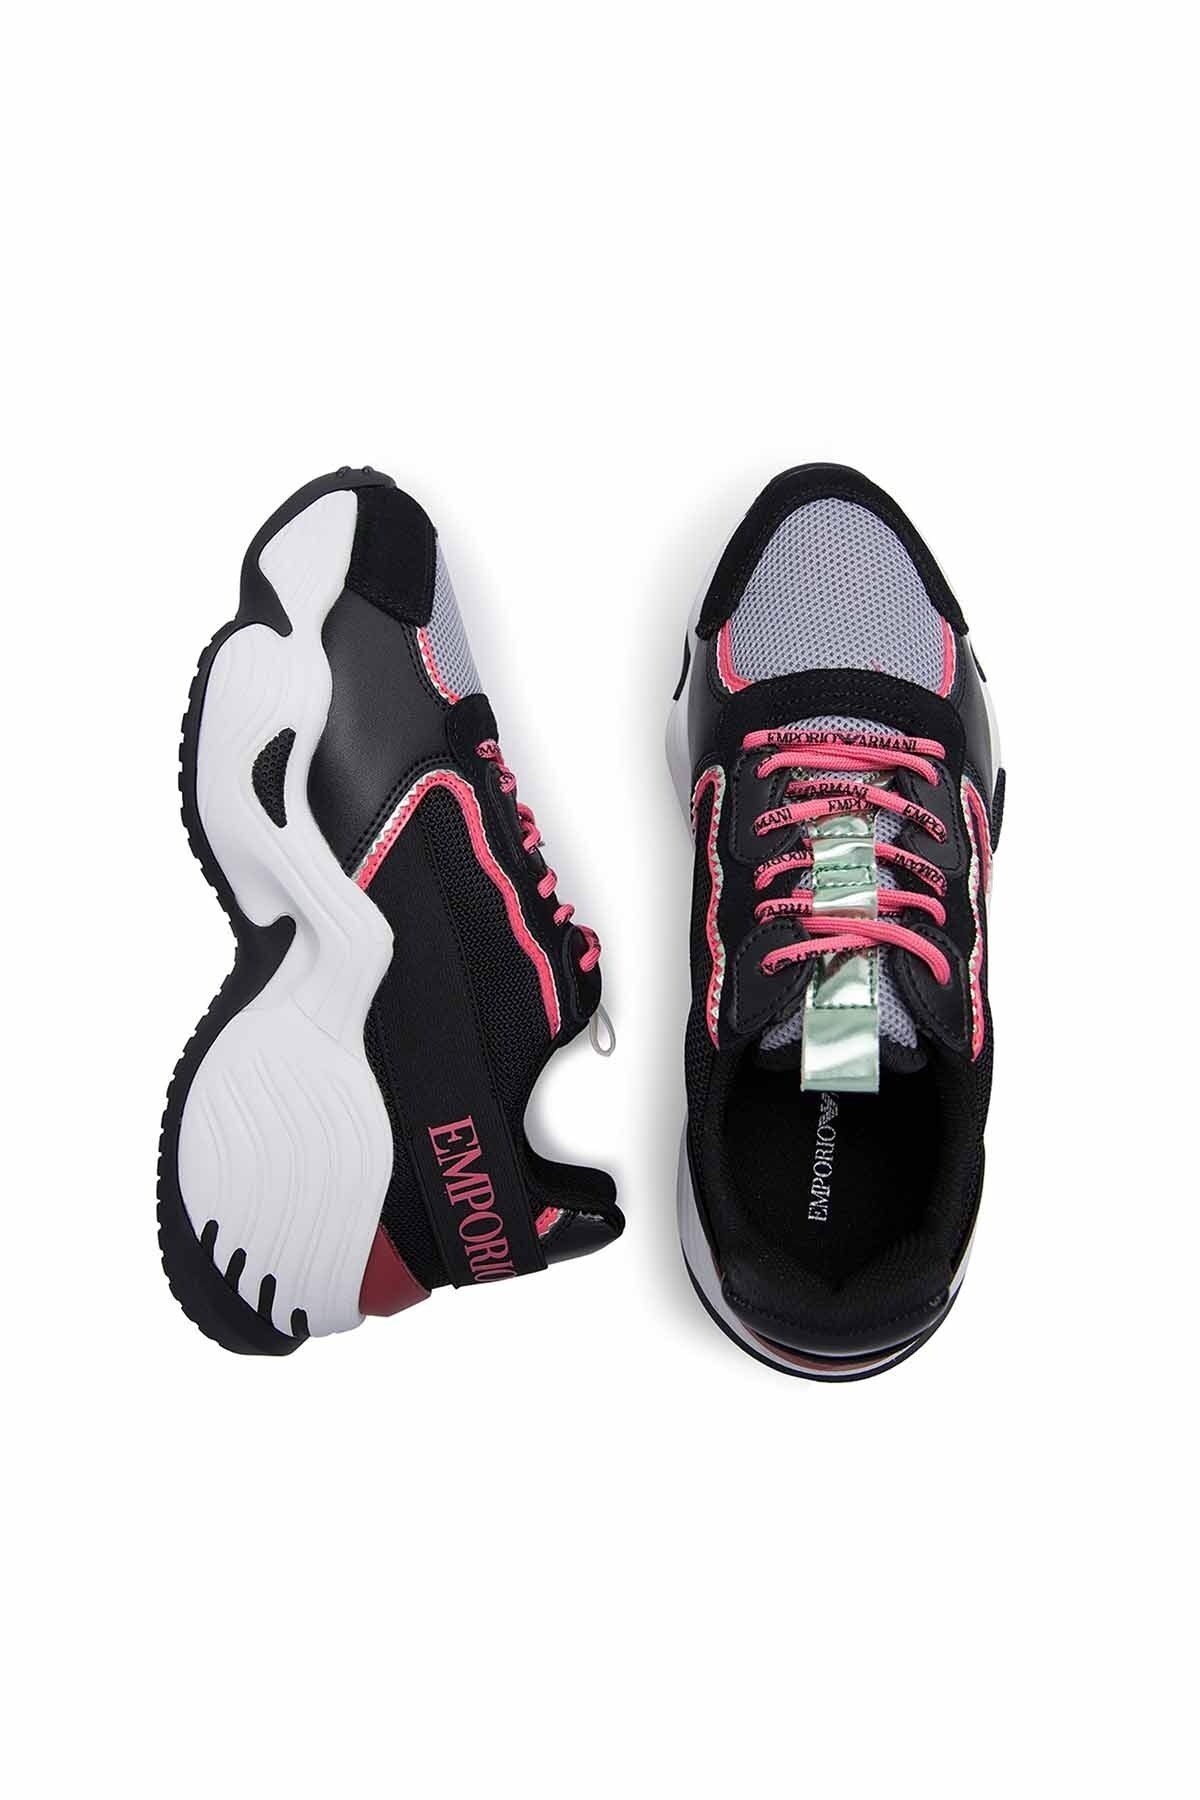 Emporio Armani Bayan Ayakkabı S X3X088 XM059 R541 SİYAH